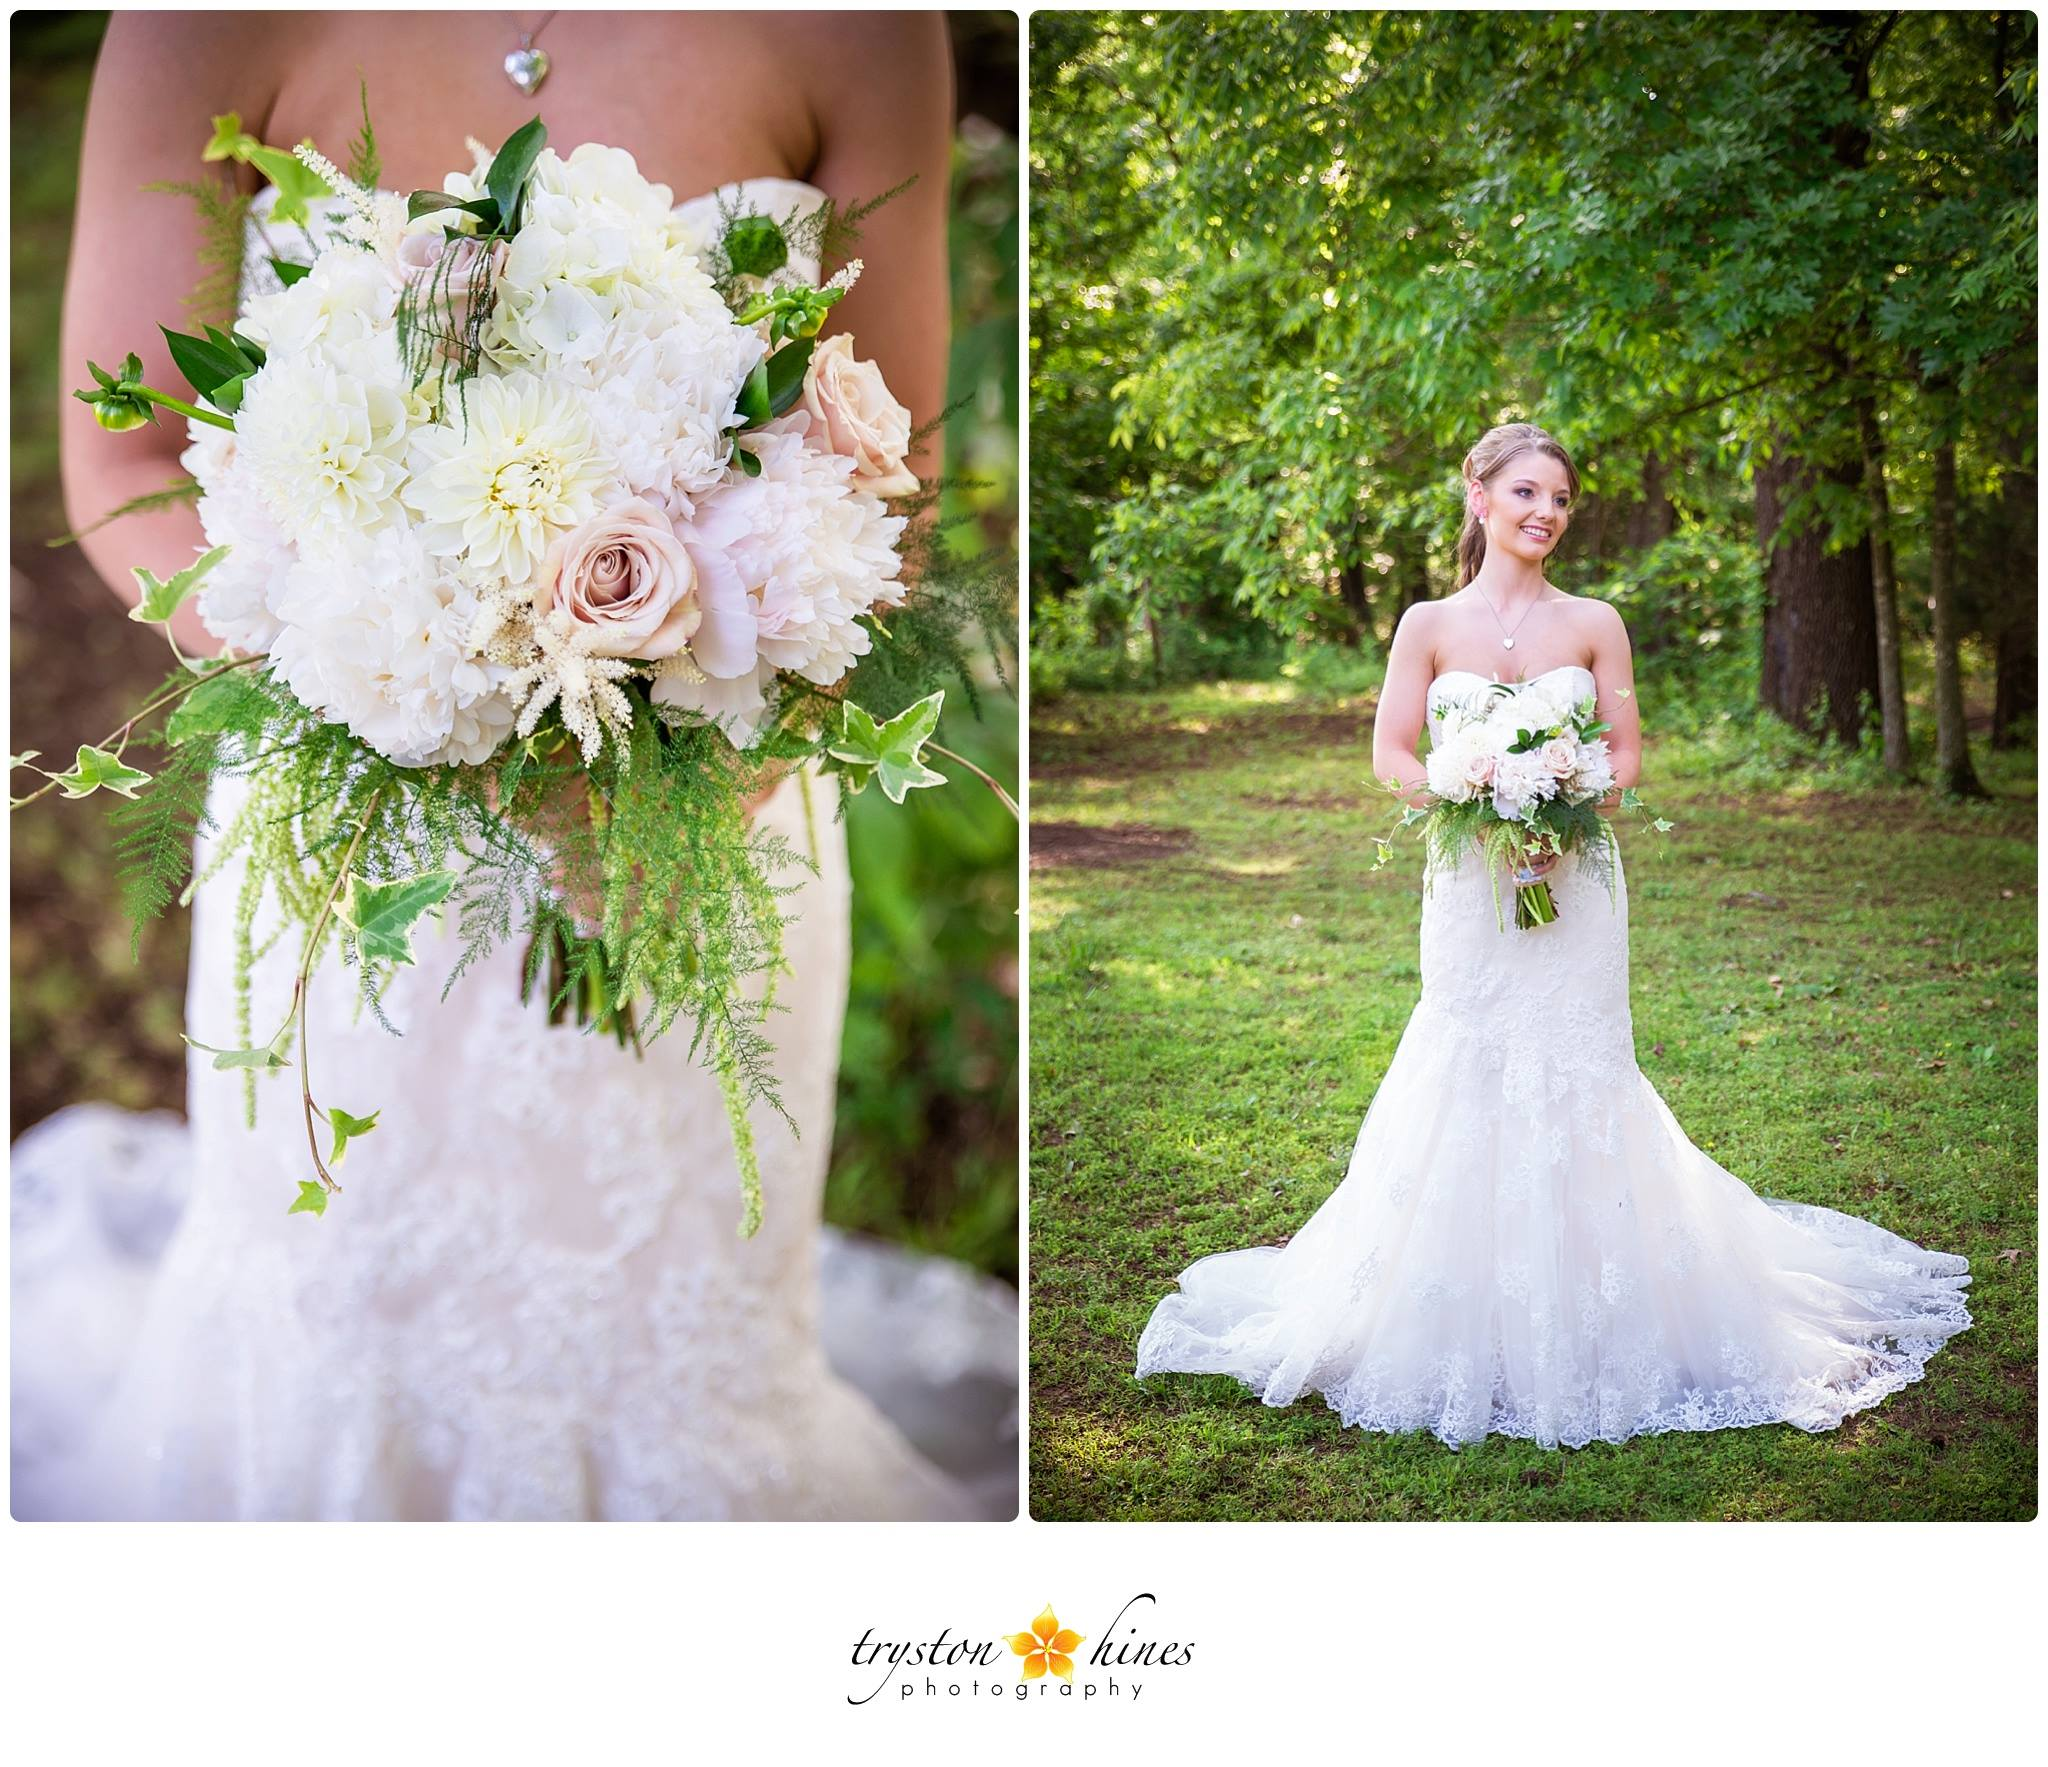 Tryston Hines Photography , from  Kierstan + Bradley 's wedding